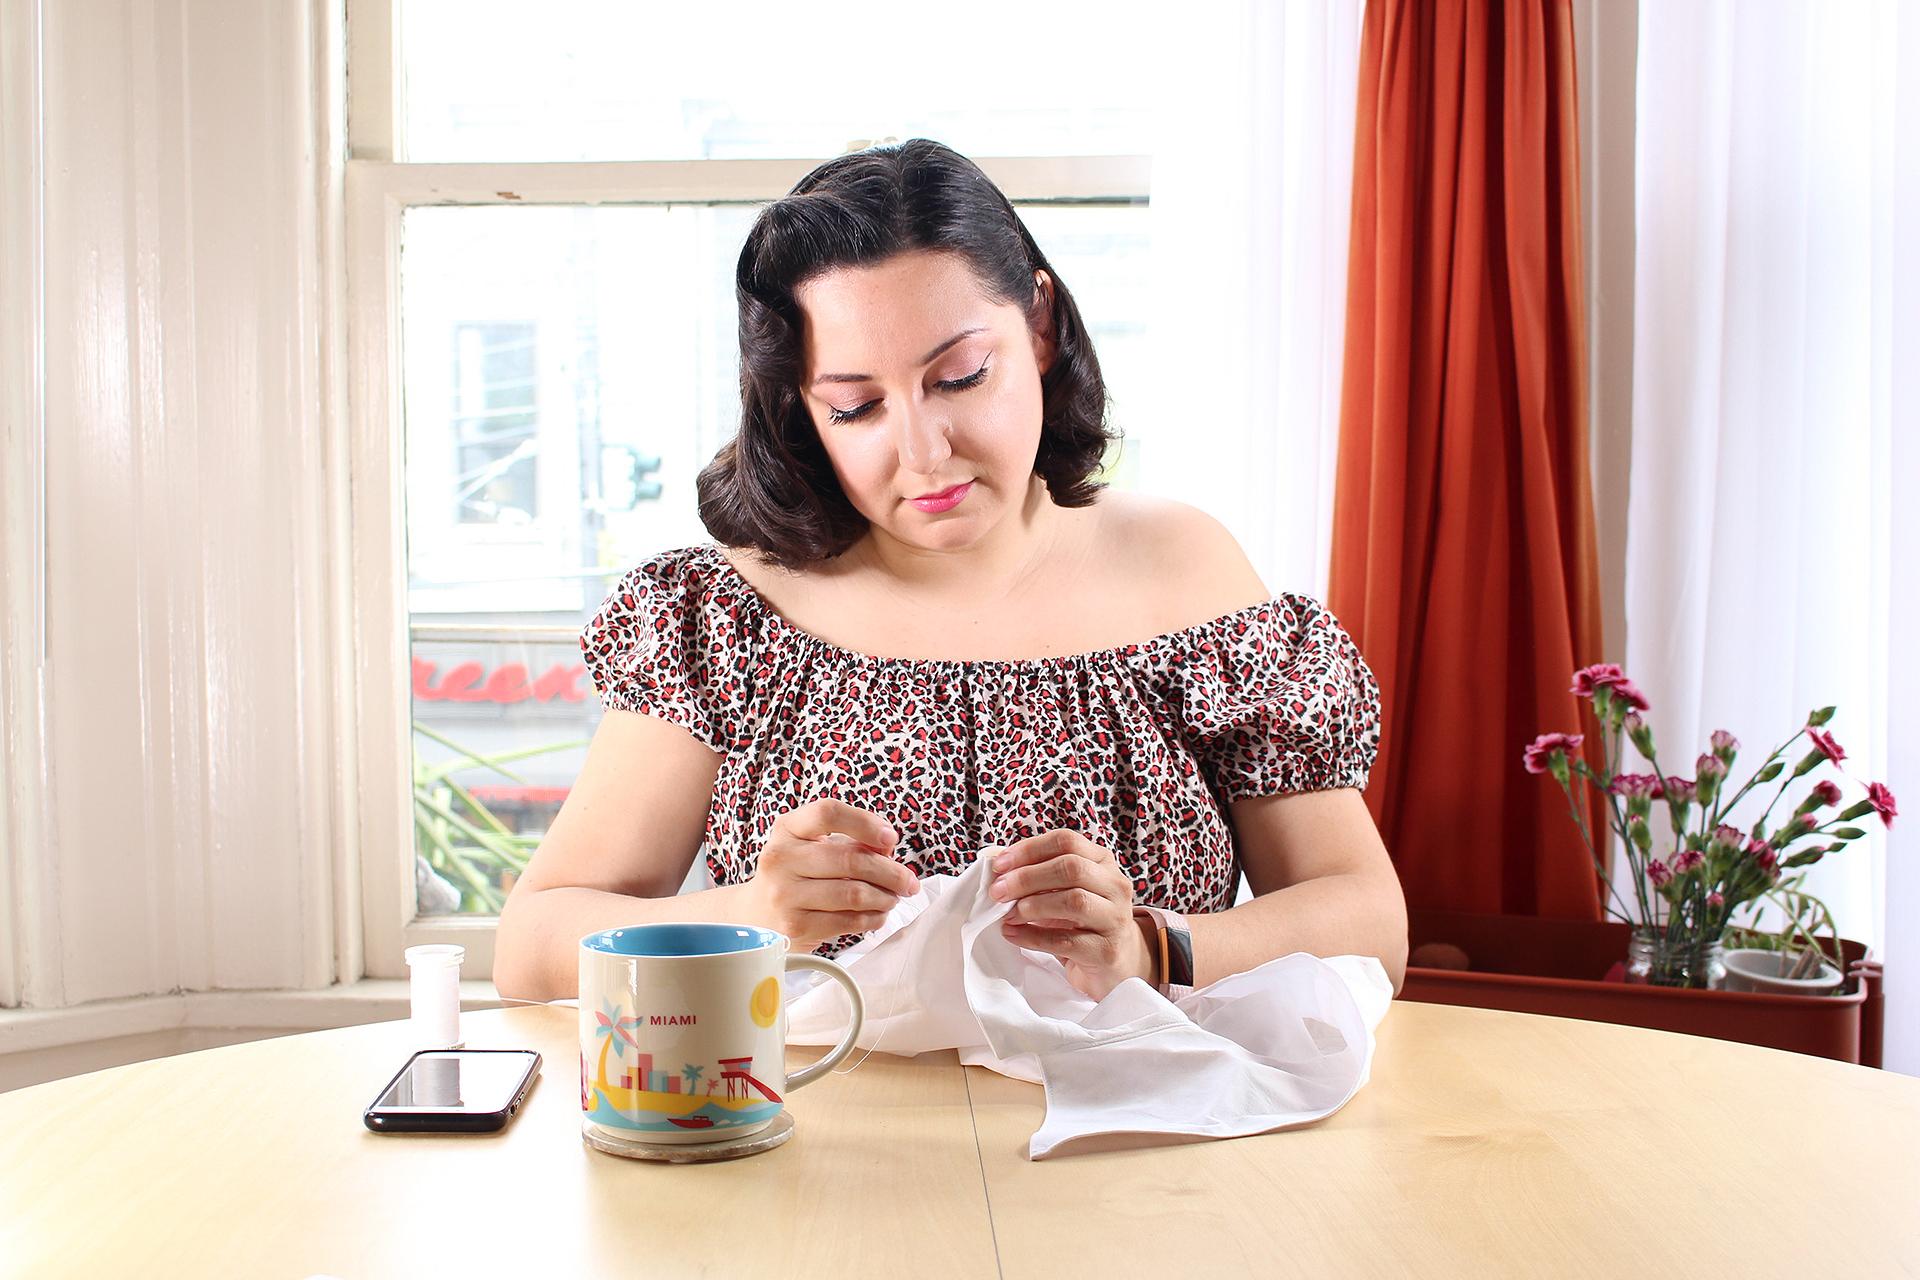 Sewing something yourself instills pride. | Vintage on Tap